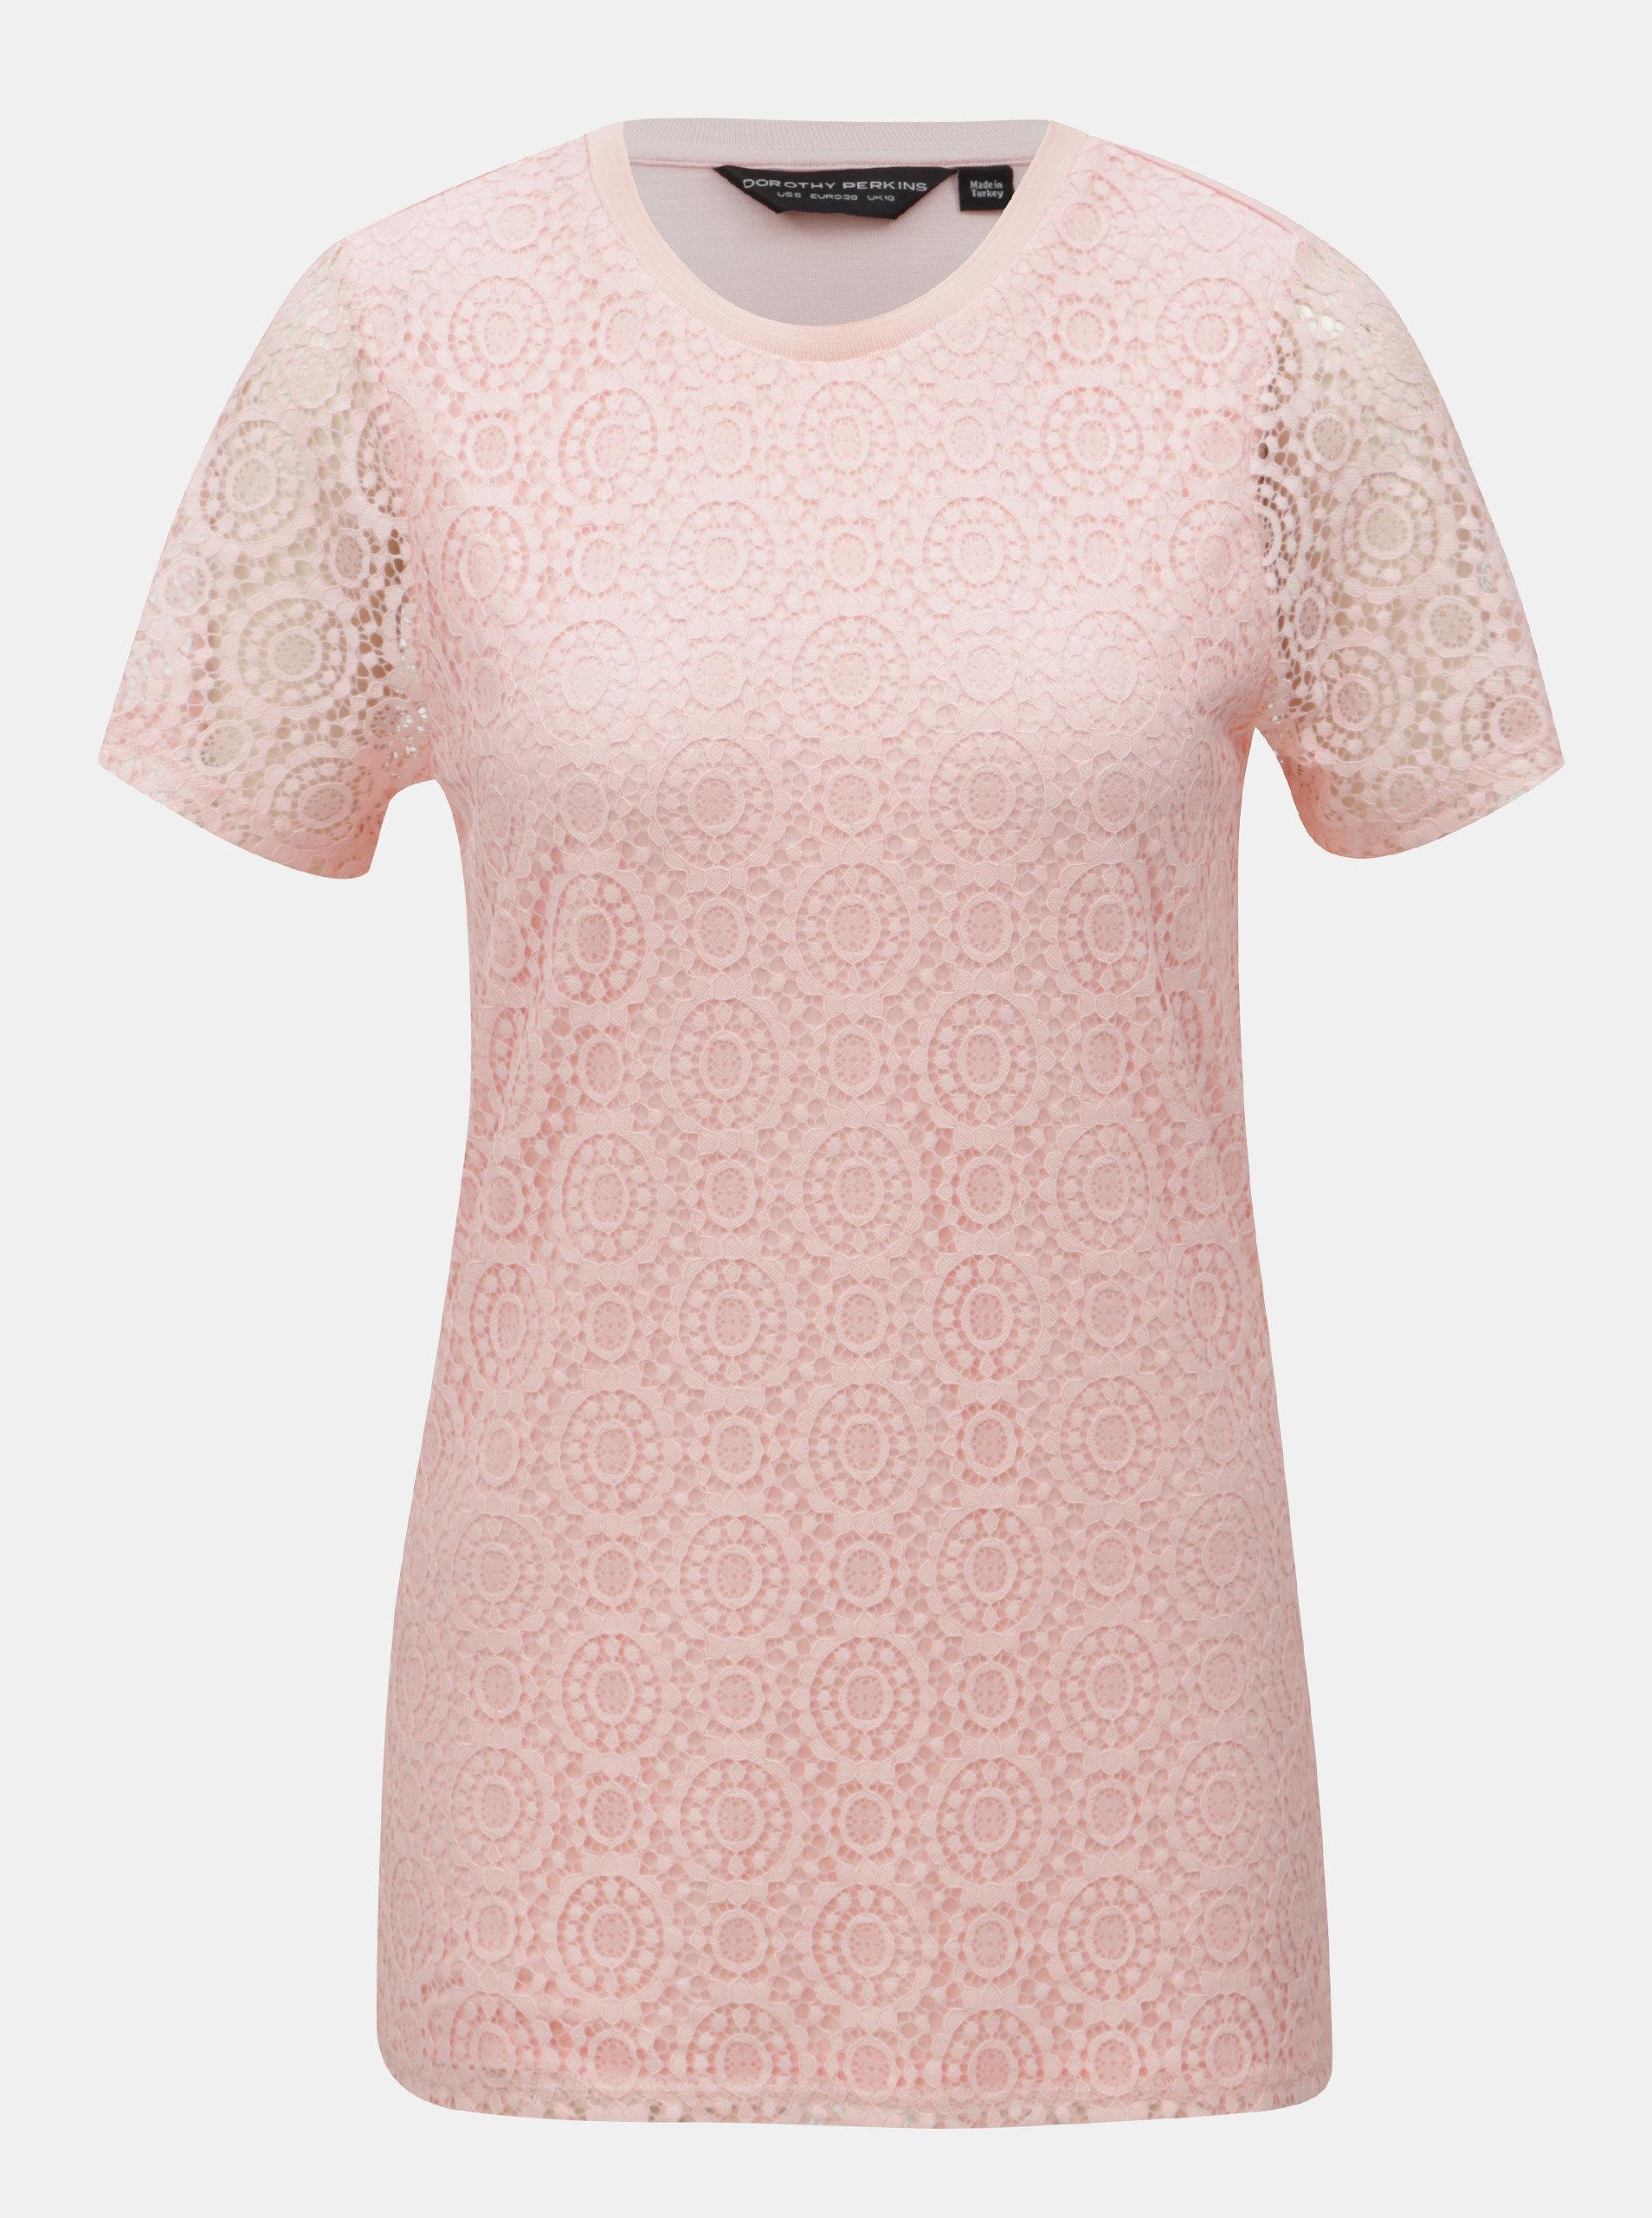 e34f393356 Světle růžové krajkové tričko Dorothy Perkins ...